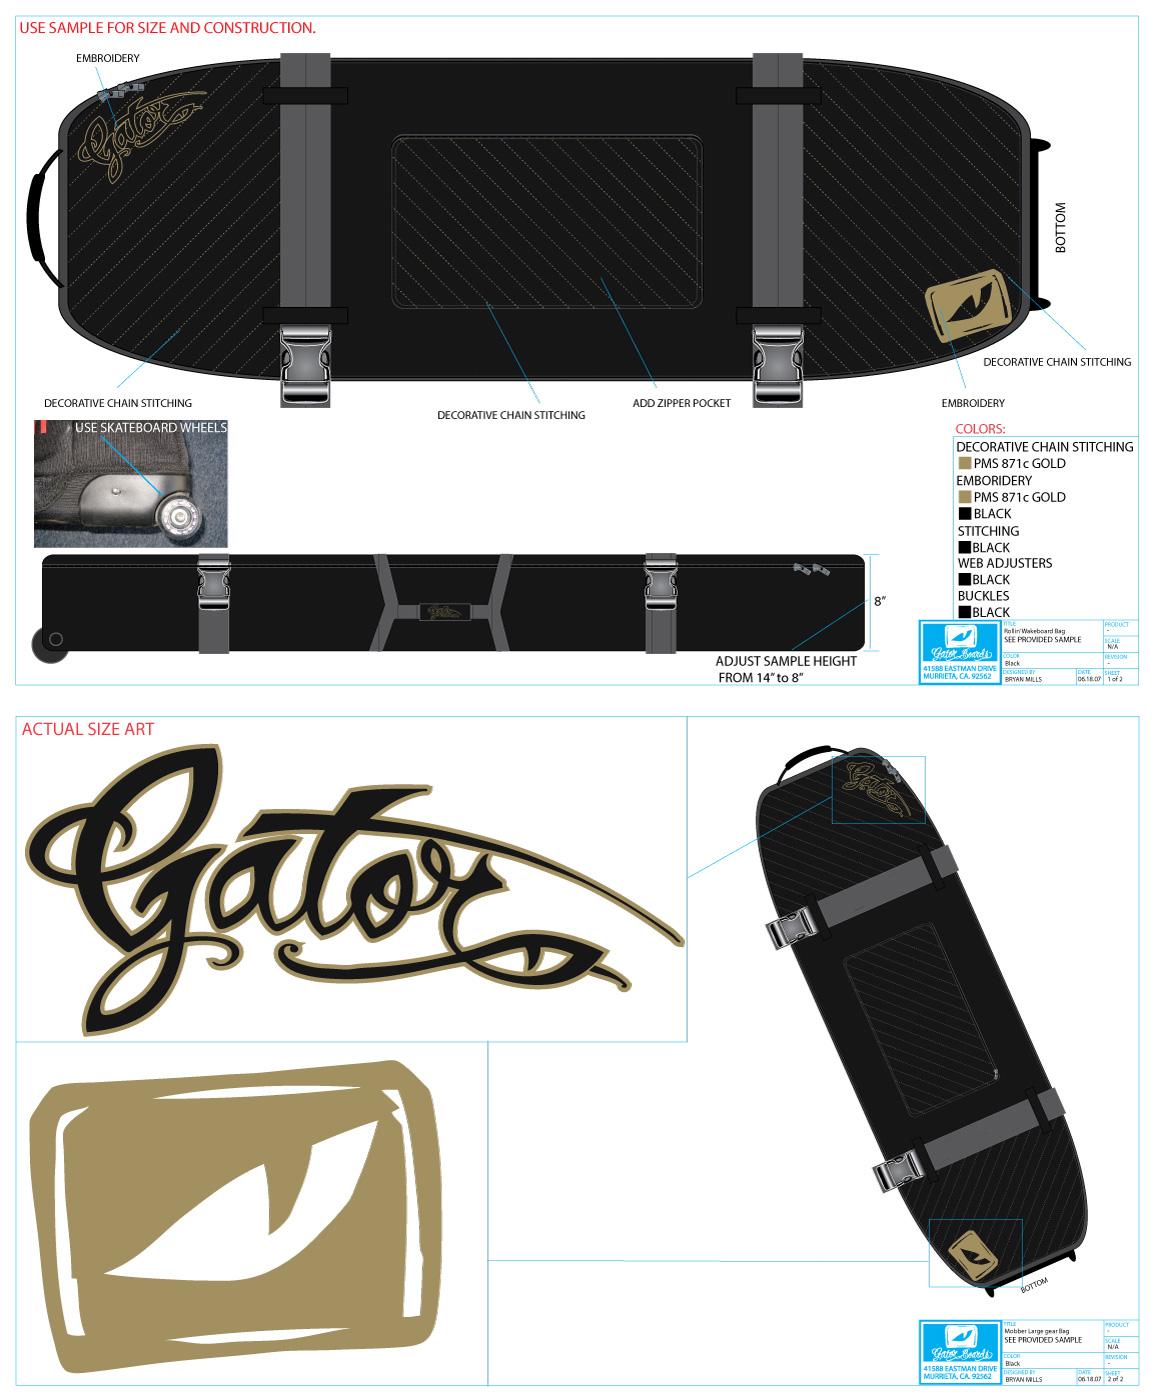 Gator_Wakeboard_TravelBag.jpg